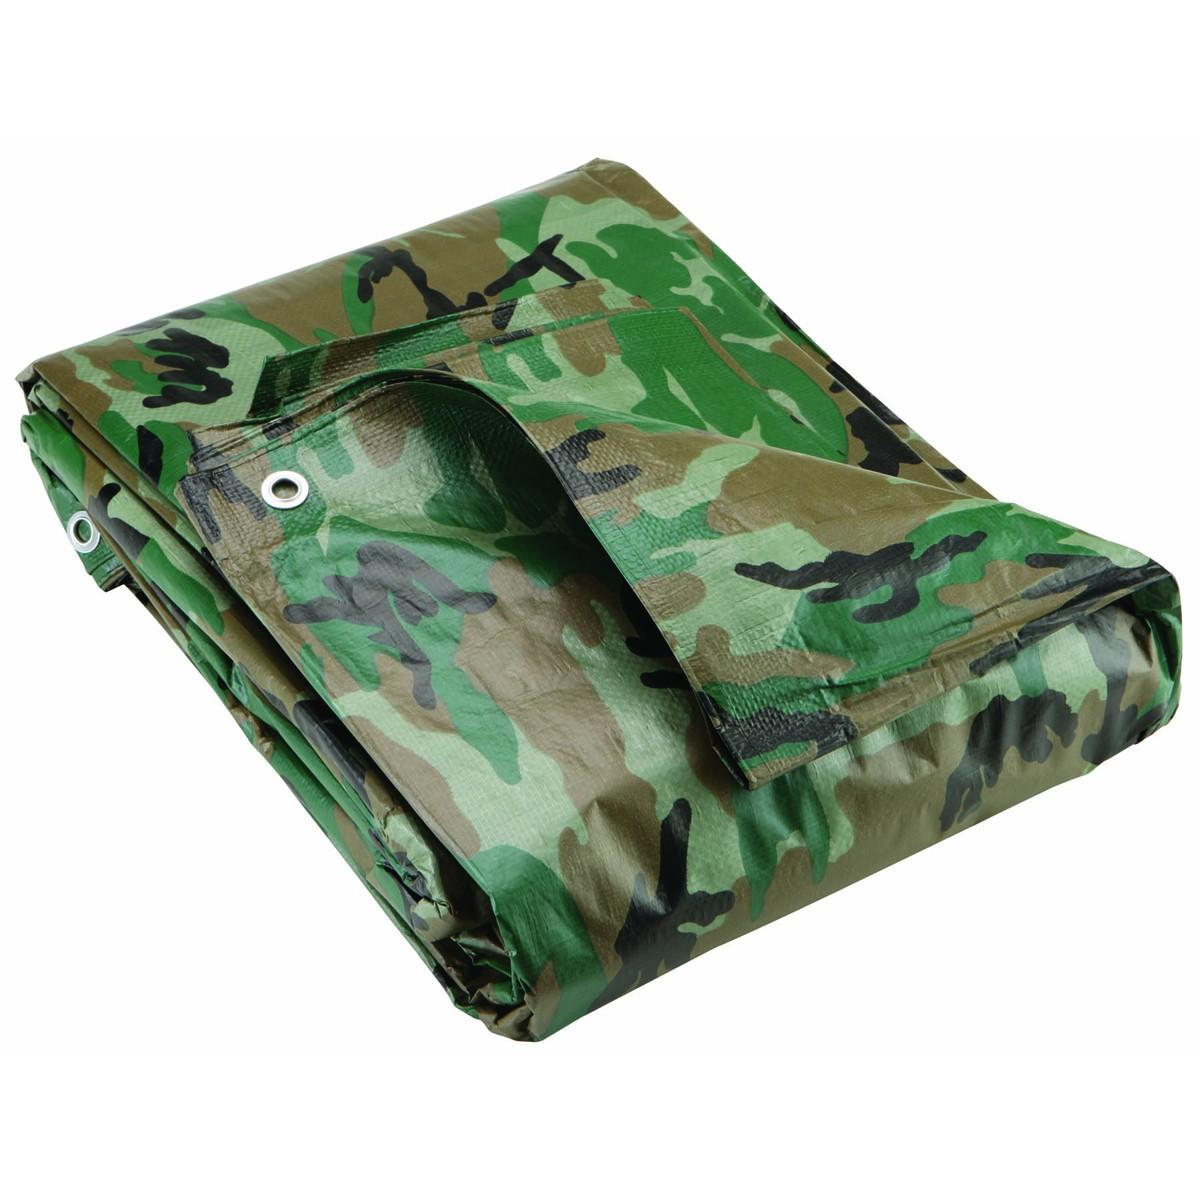 10 ft. x 12 ft. Camo Camouflage Tarp PPPB